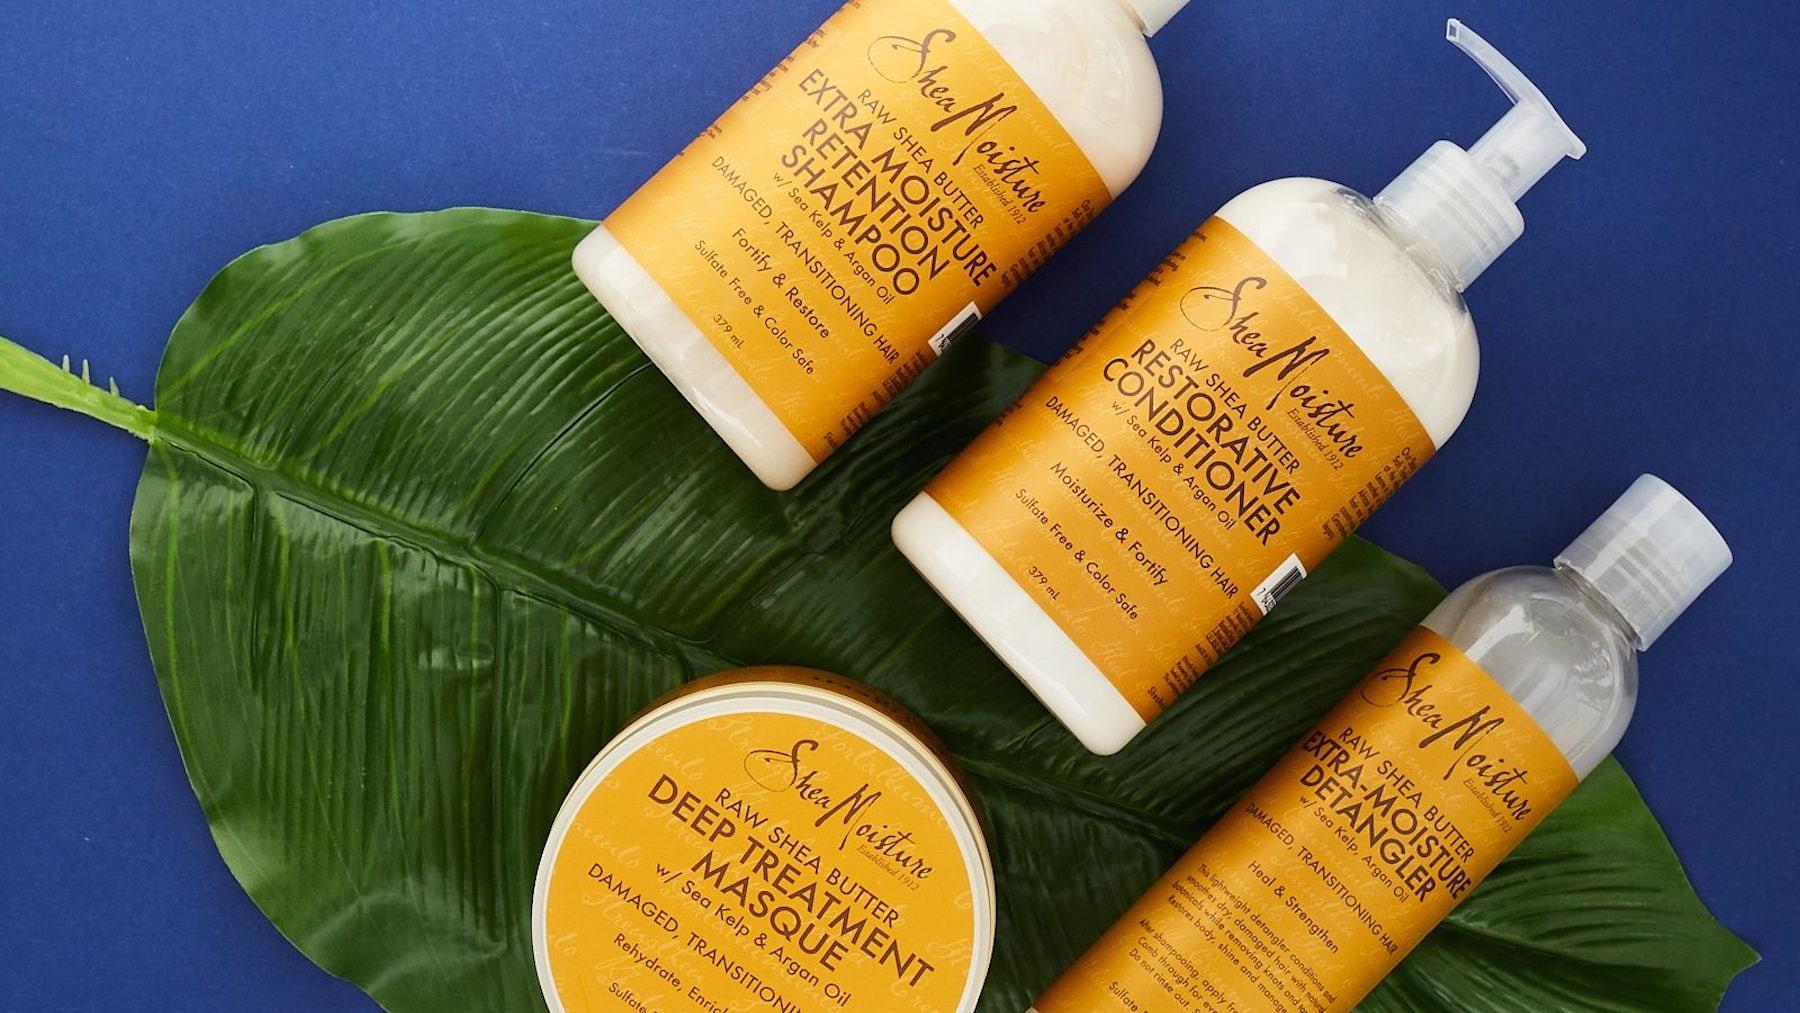 Sundial Brands makes SheaMoisture products | Source: SheaMoisture